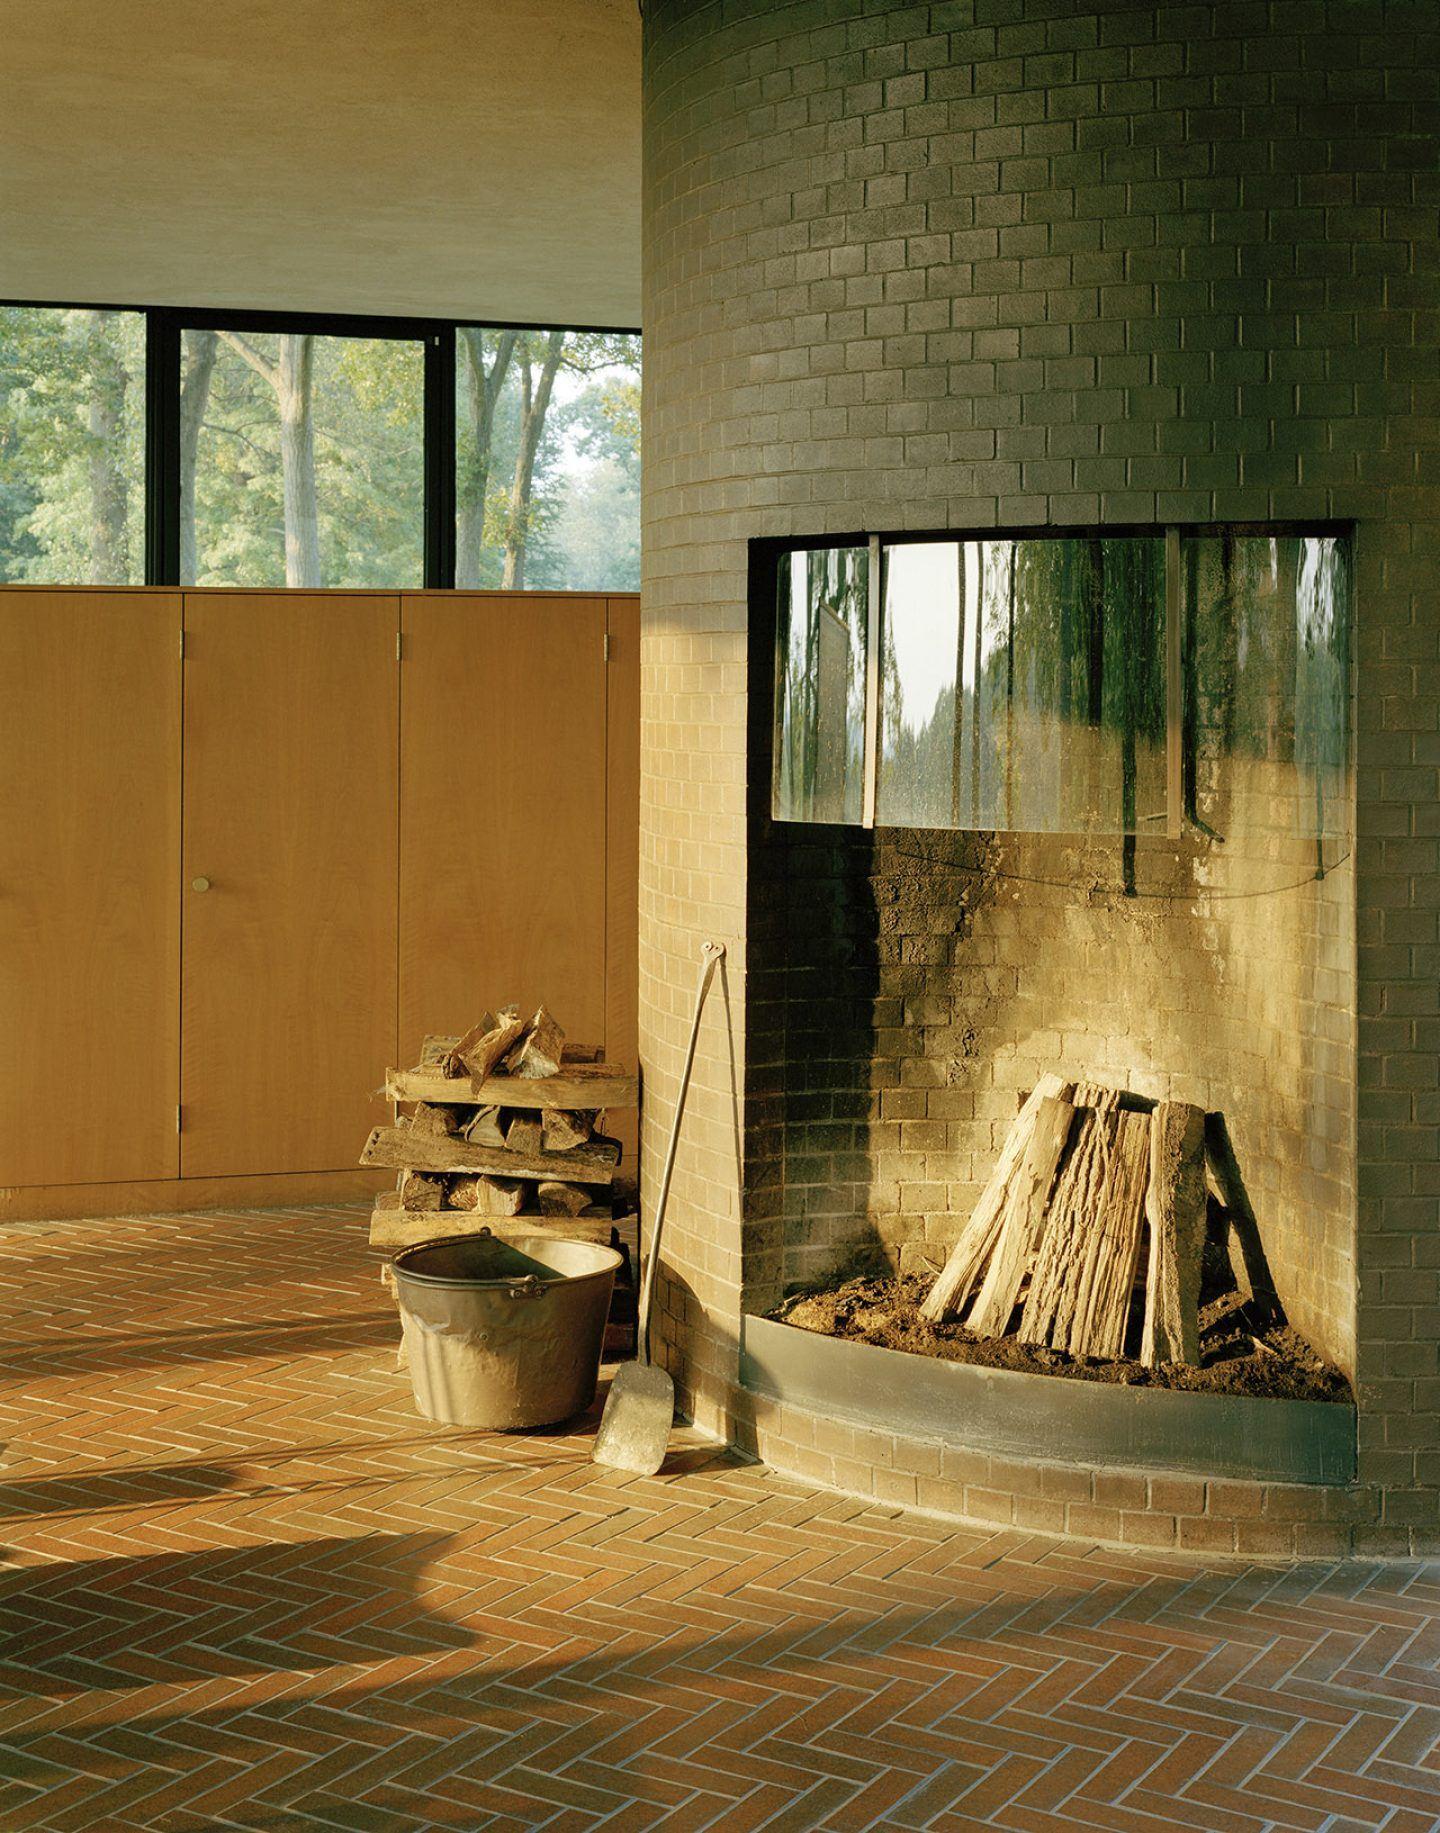 IGNANT-Architecture-Eirik-Johnson-Glasshouse-06